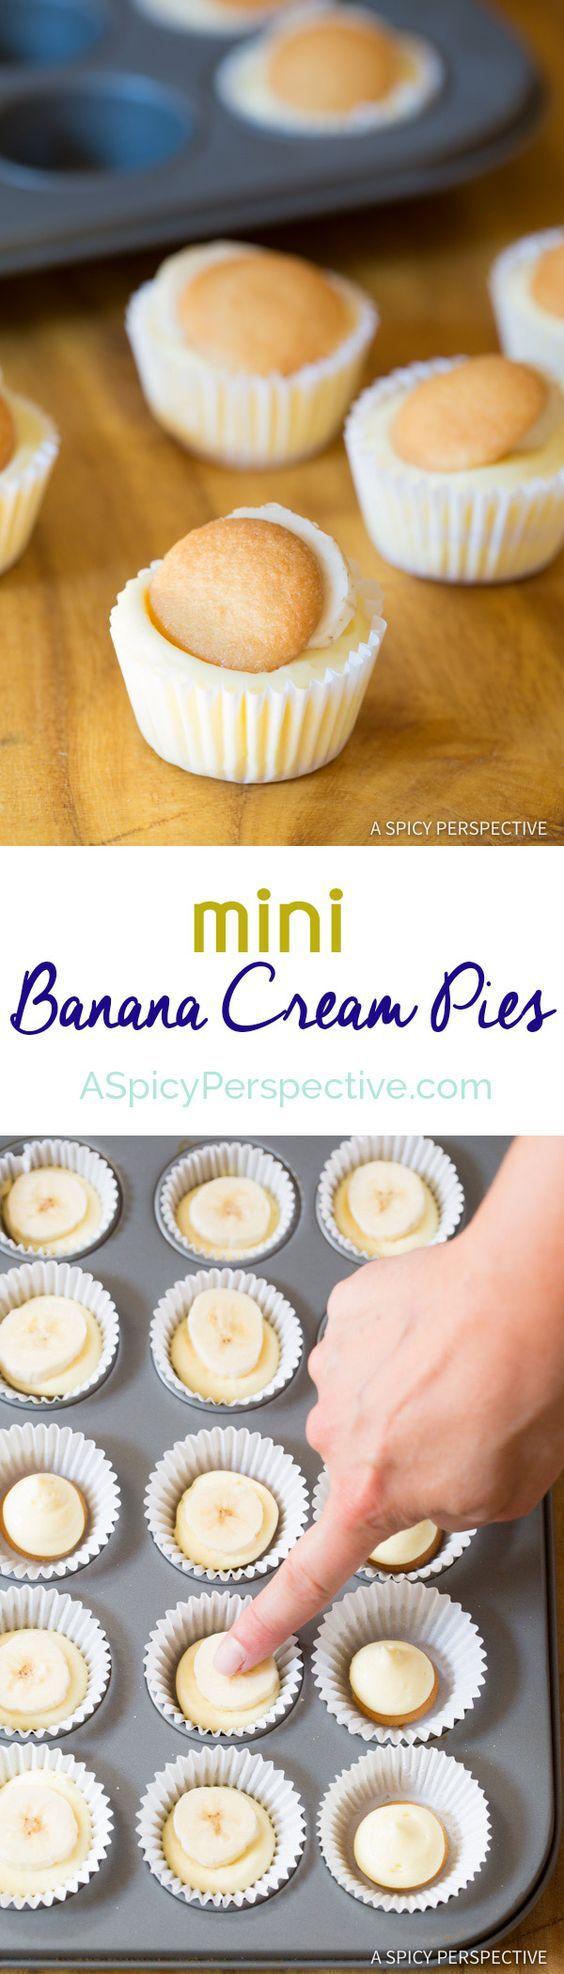 Fun to Make 6-Ingredient Mini Banana Cream Pie Recipe (Banana Pudding Tarts) on ASpicyPerspective...